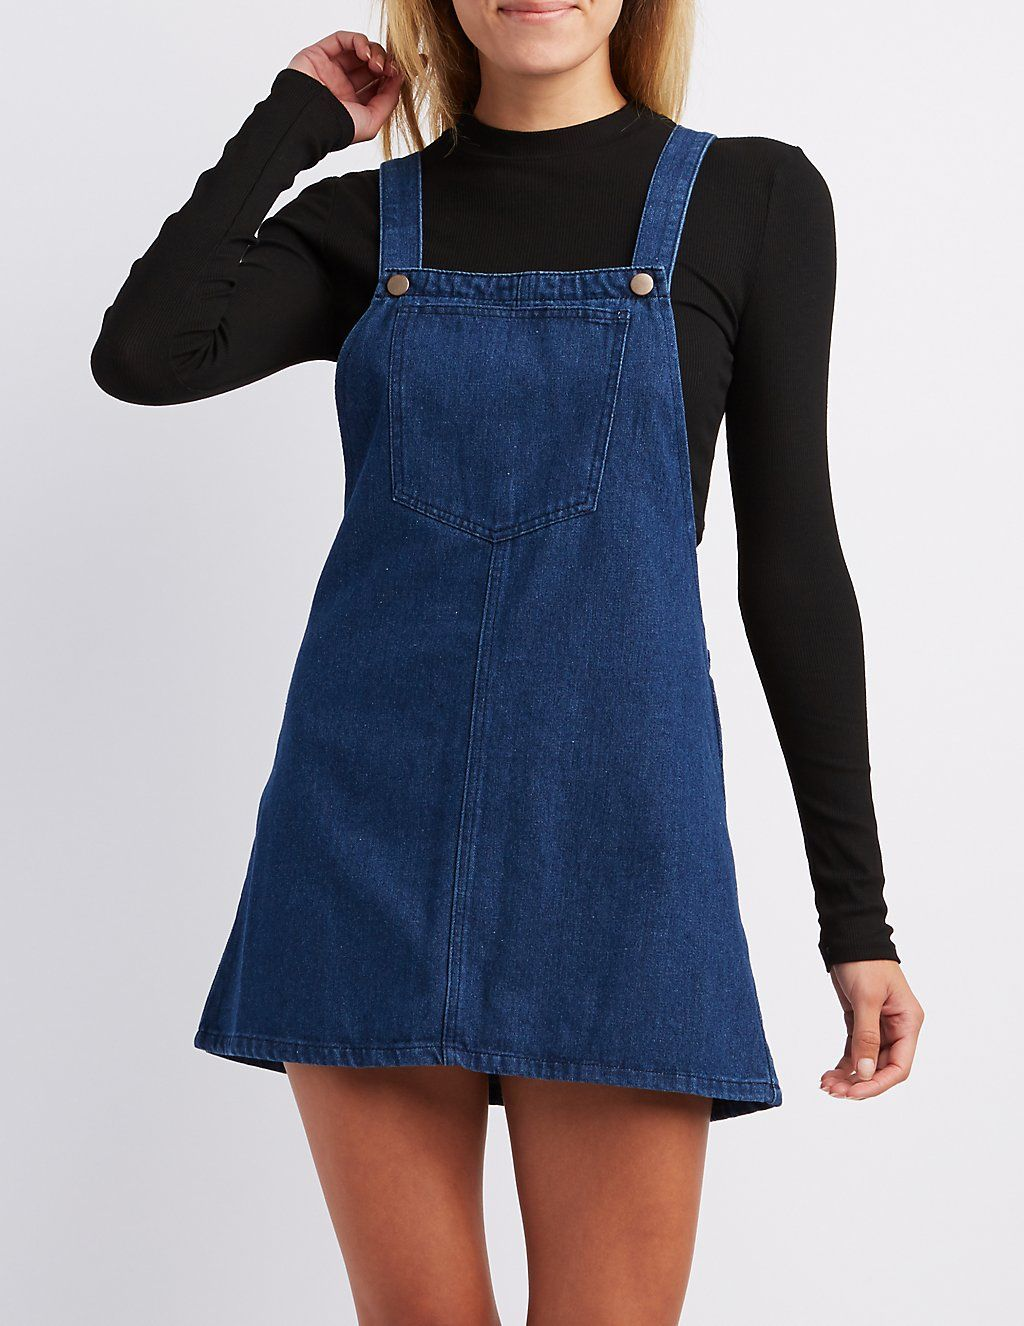 59d3753a341b Denim Shift Jumper  charlottelook Early Fall Outfits